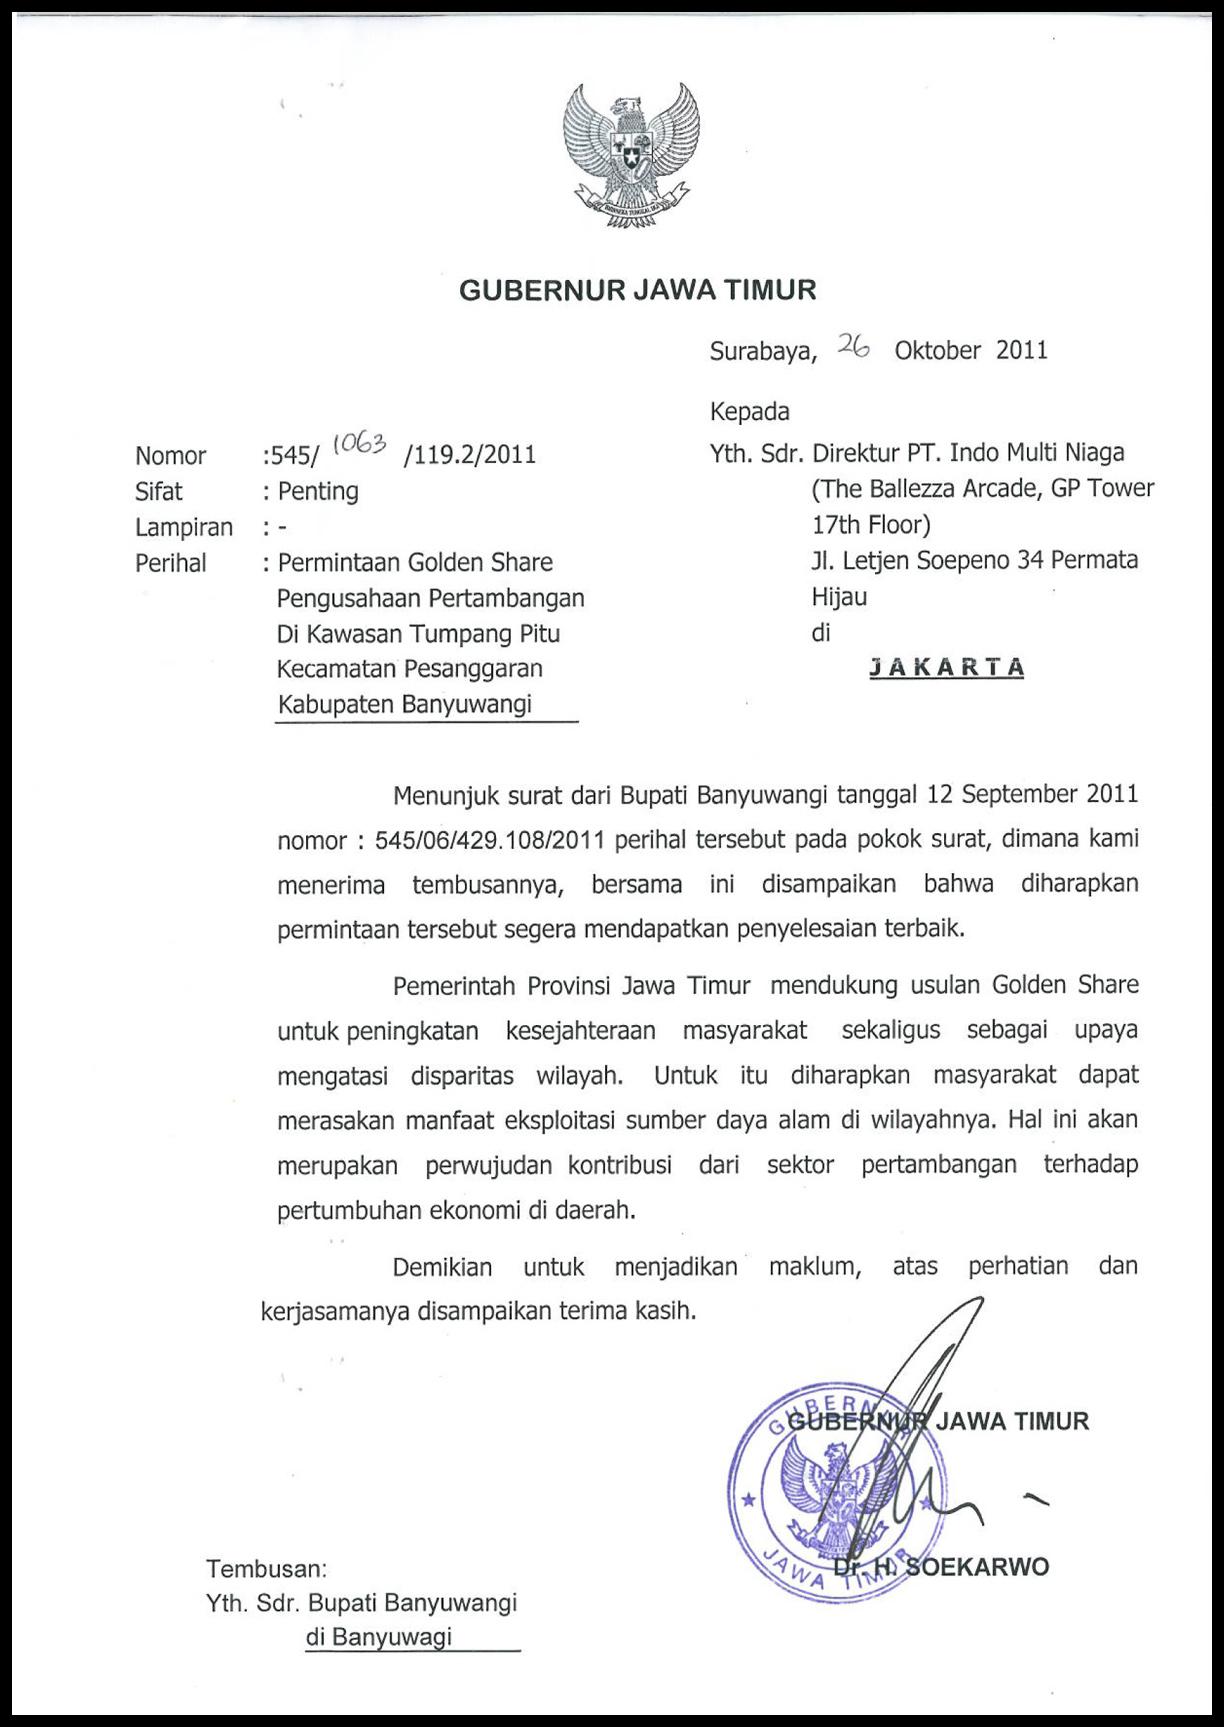 T7_surat Gubernur Jatim dukungan golden share_2011-10-26